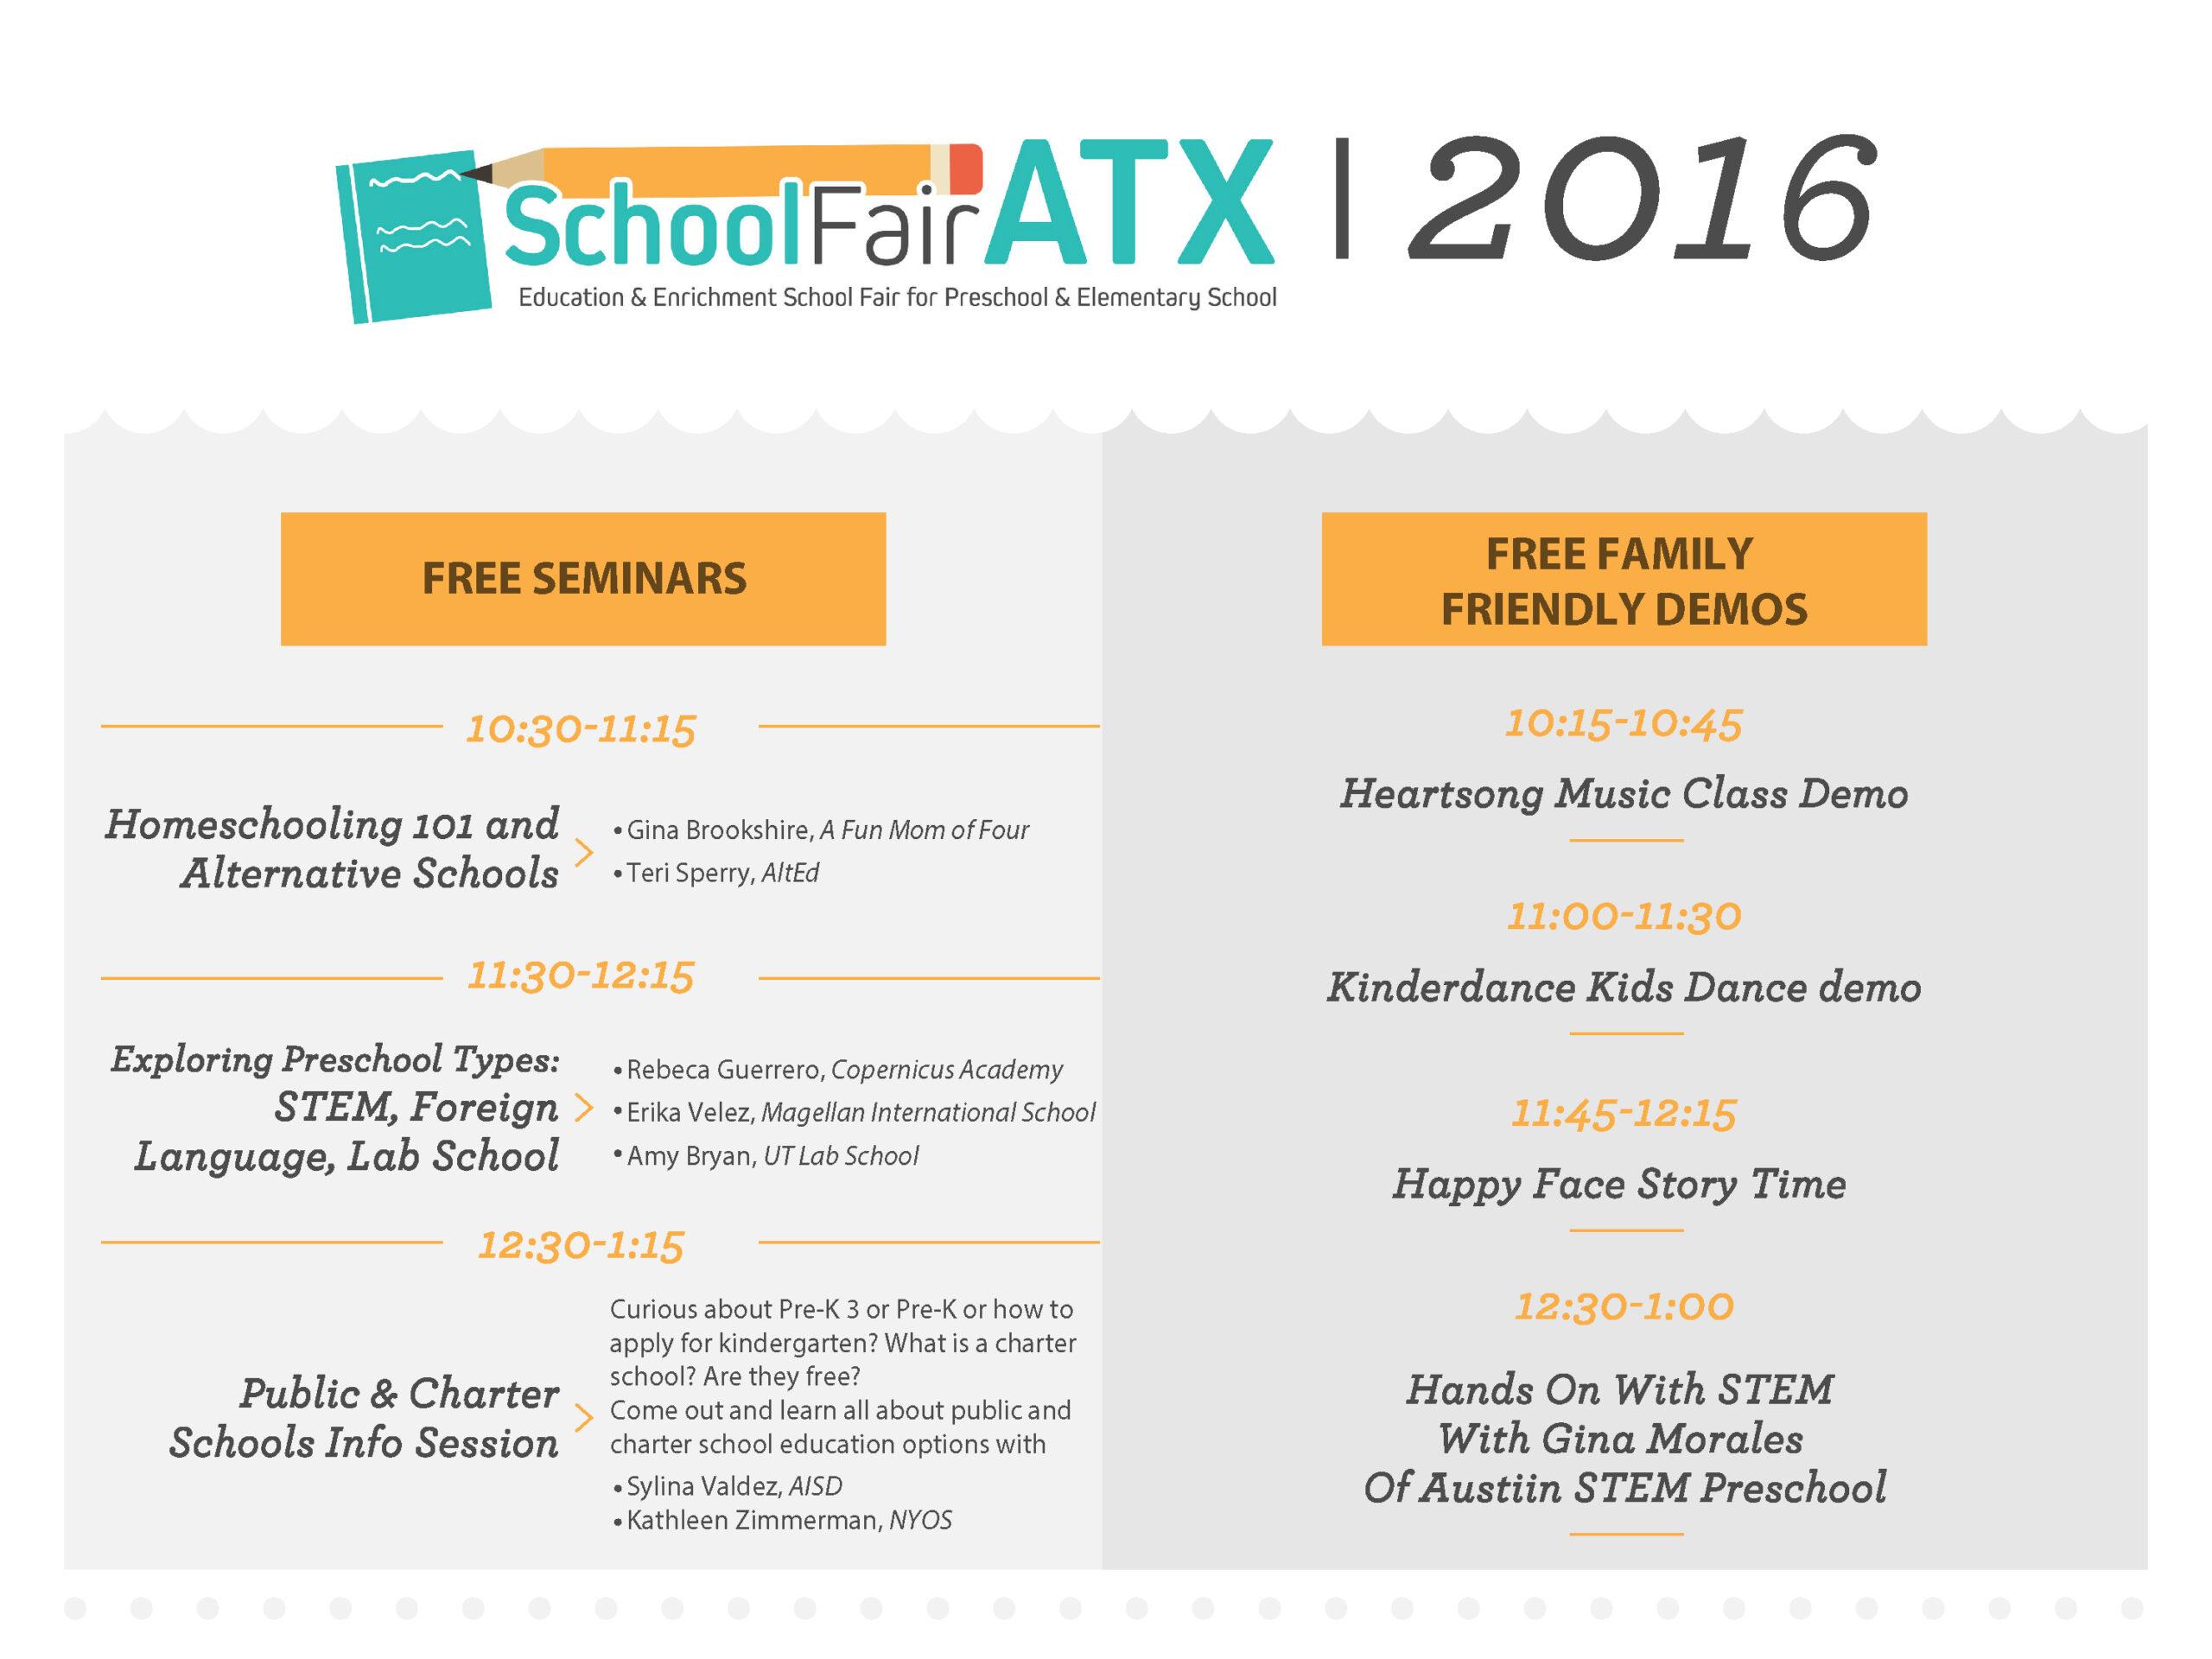 SchoolFair ATX schedule - Free Fun in Austin